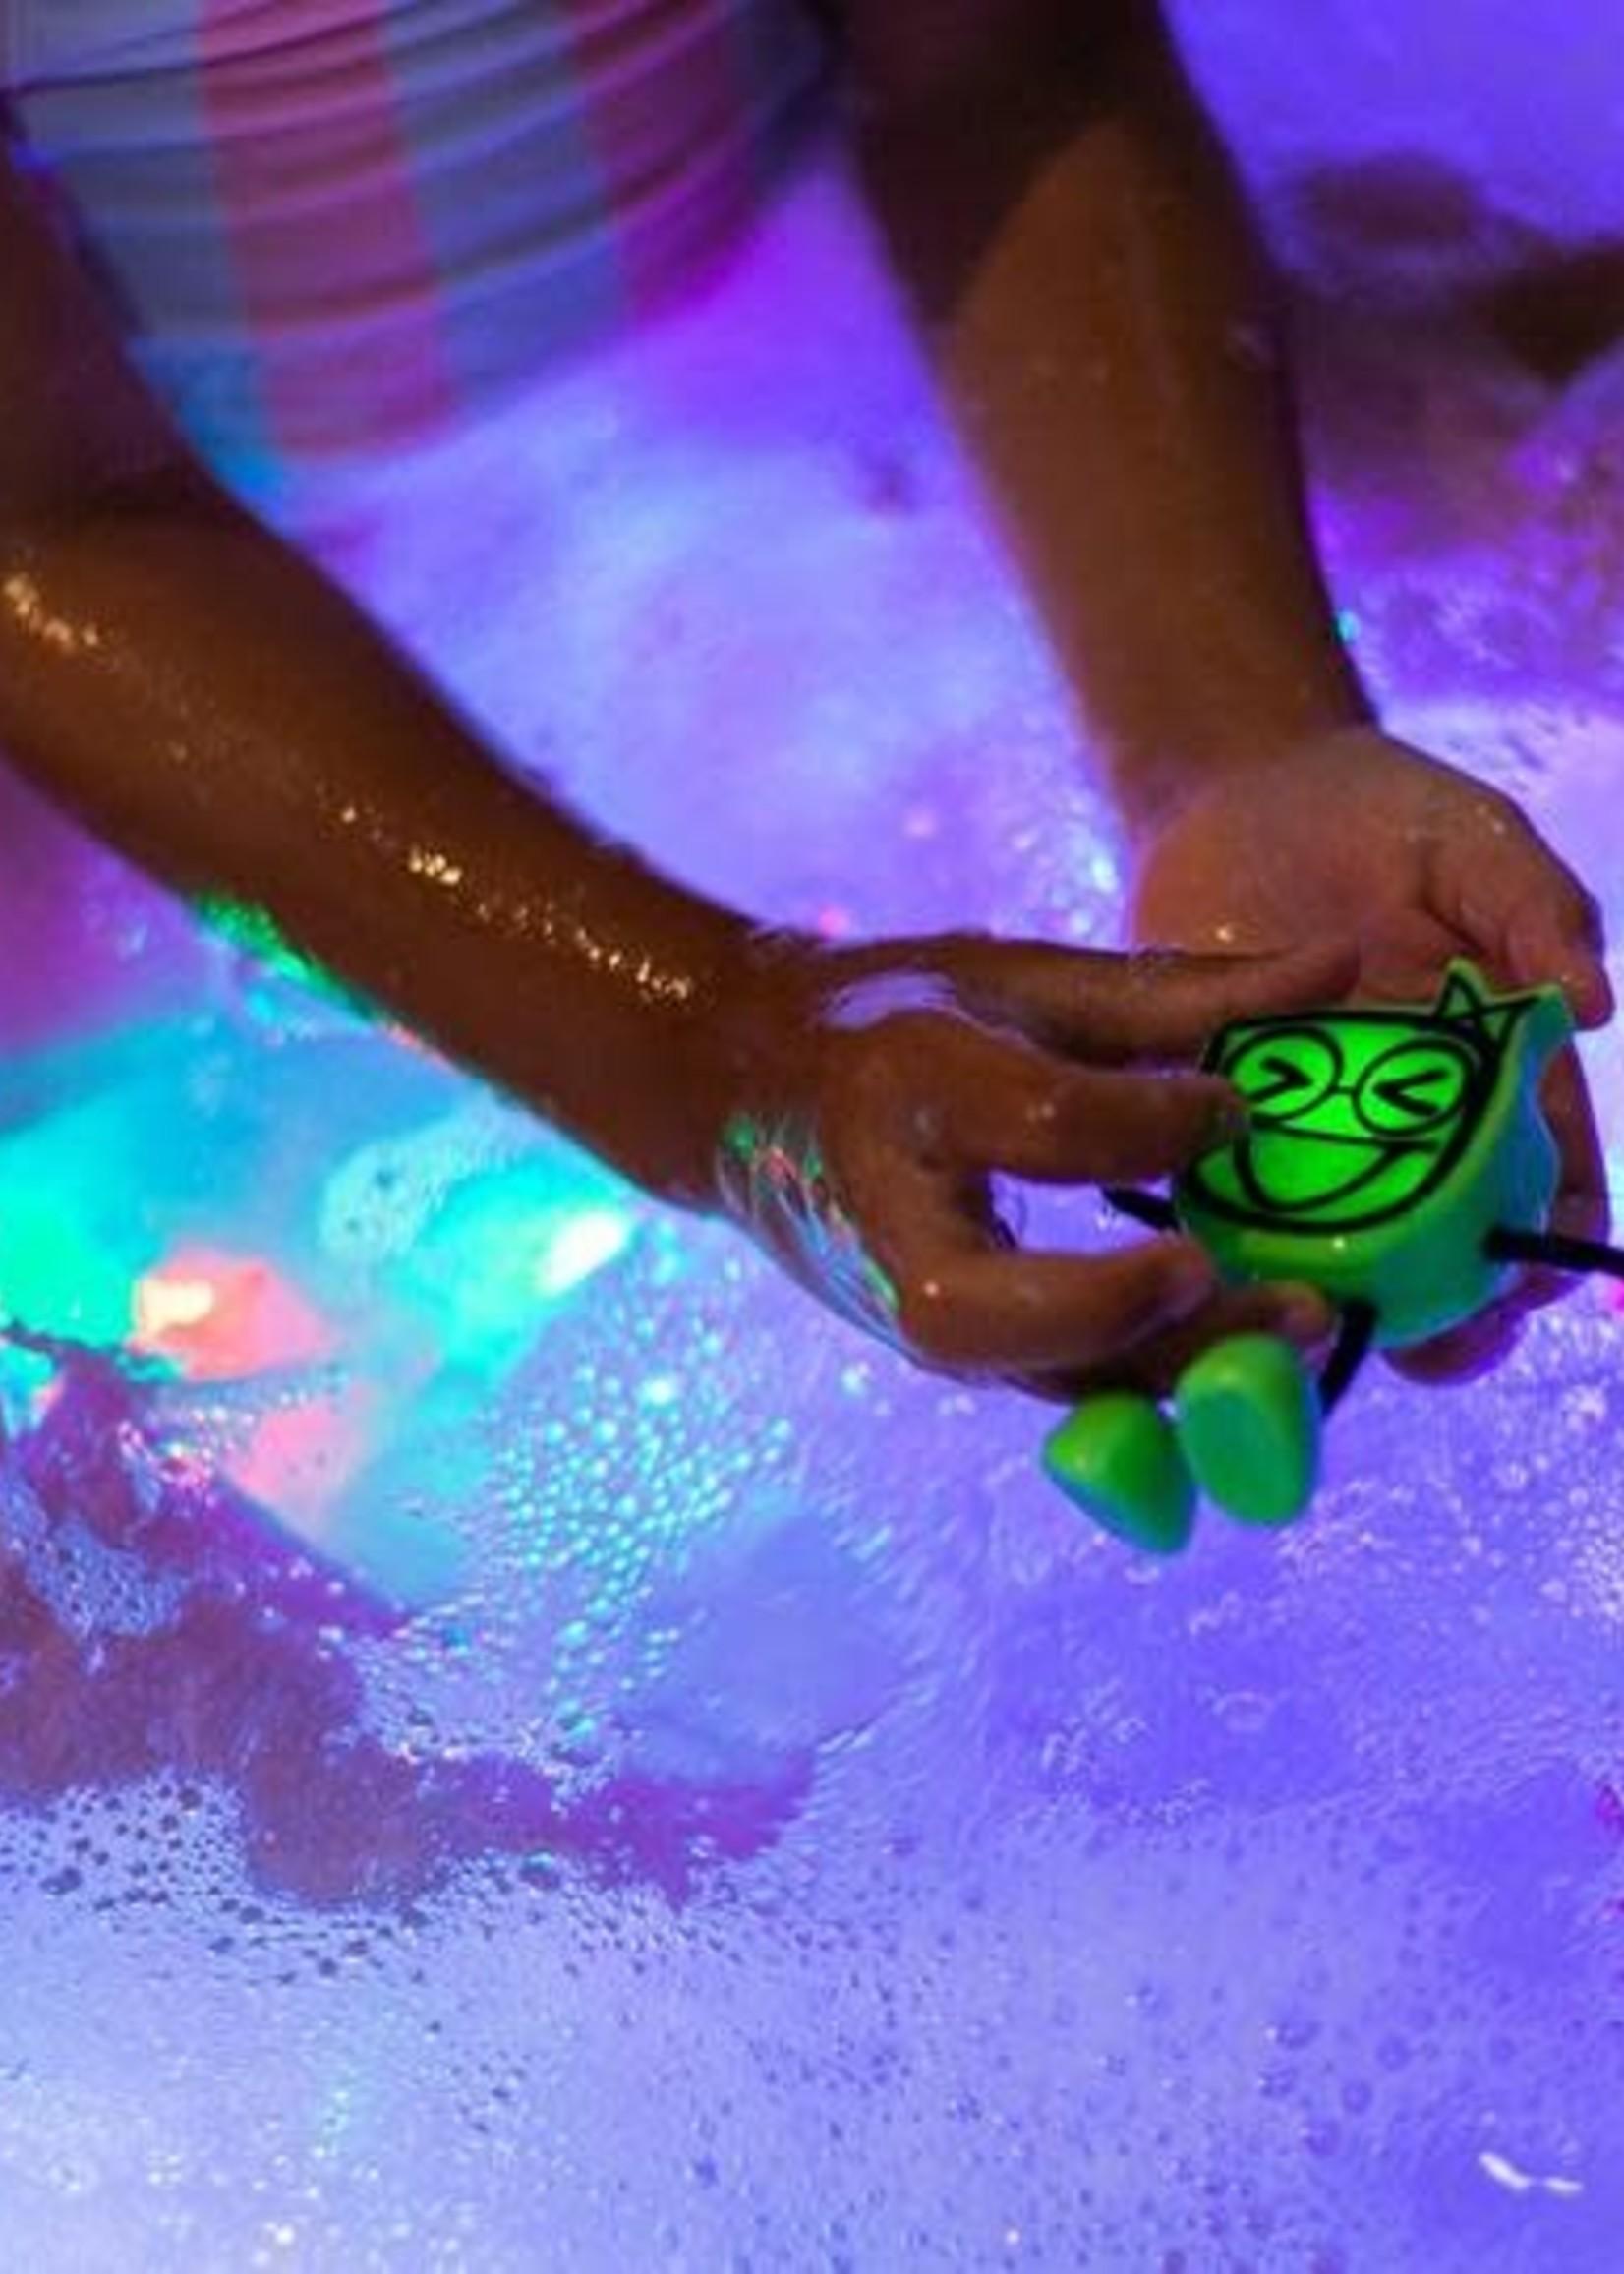 Glo Pals Glo Pals Light Up Bath Toy (Pippa Green)